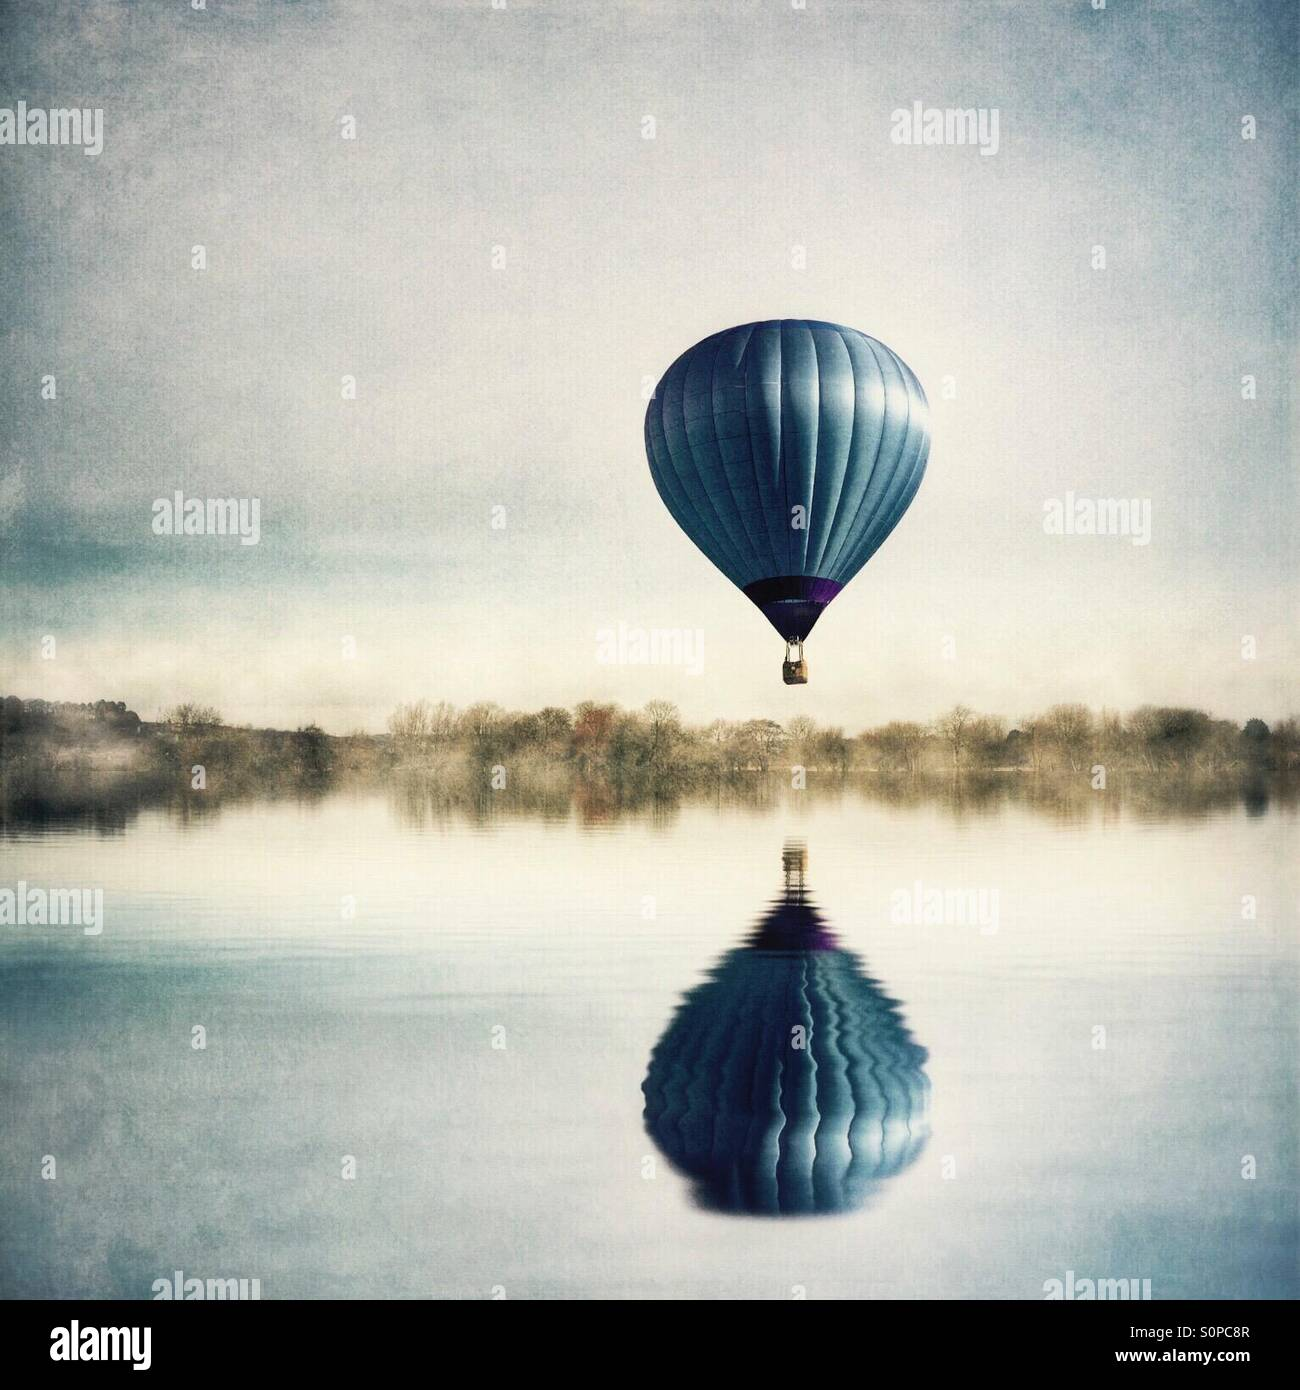 Reflexion der Heißluftballon in See Stockbild